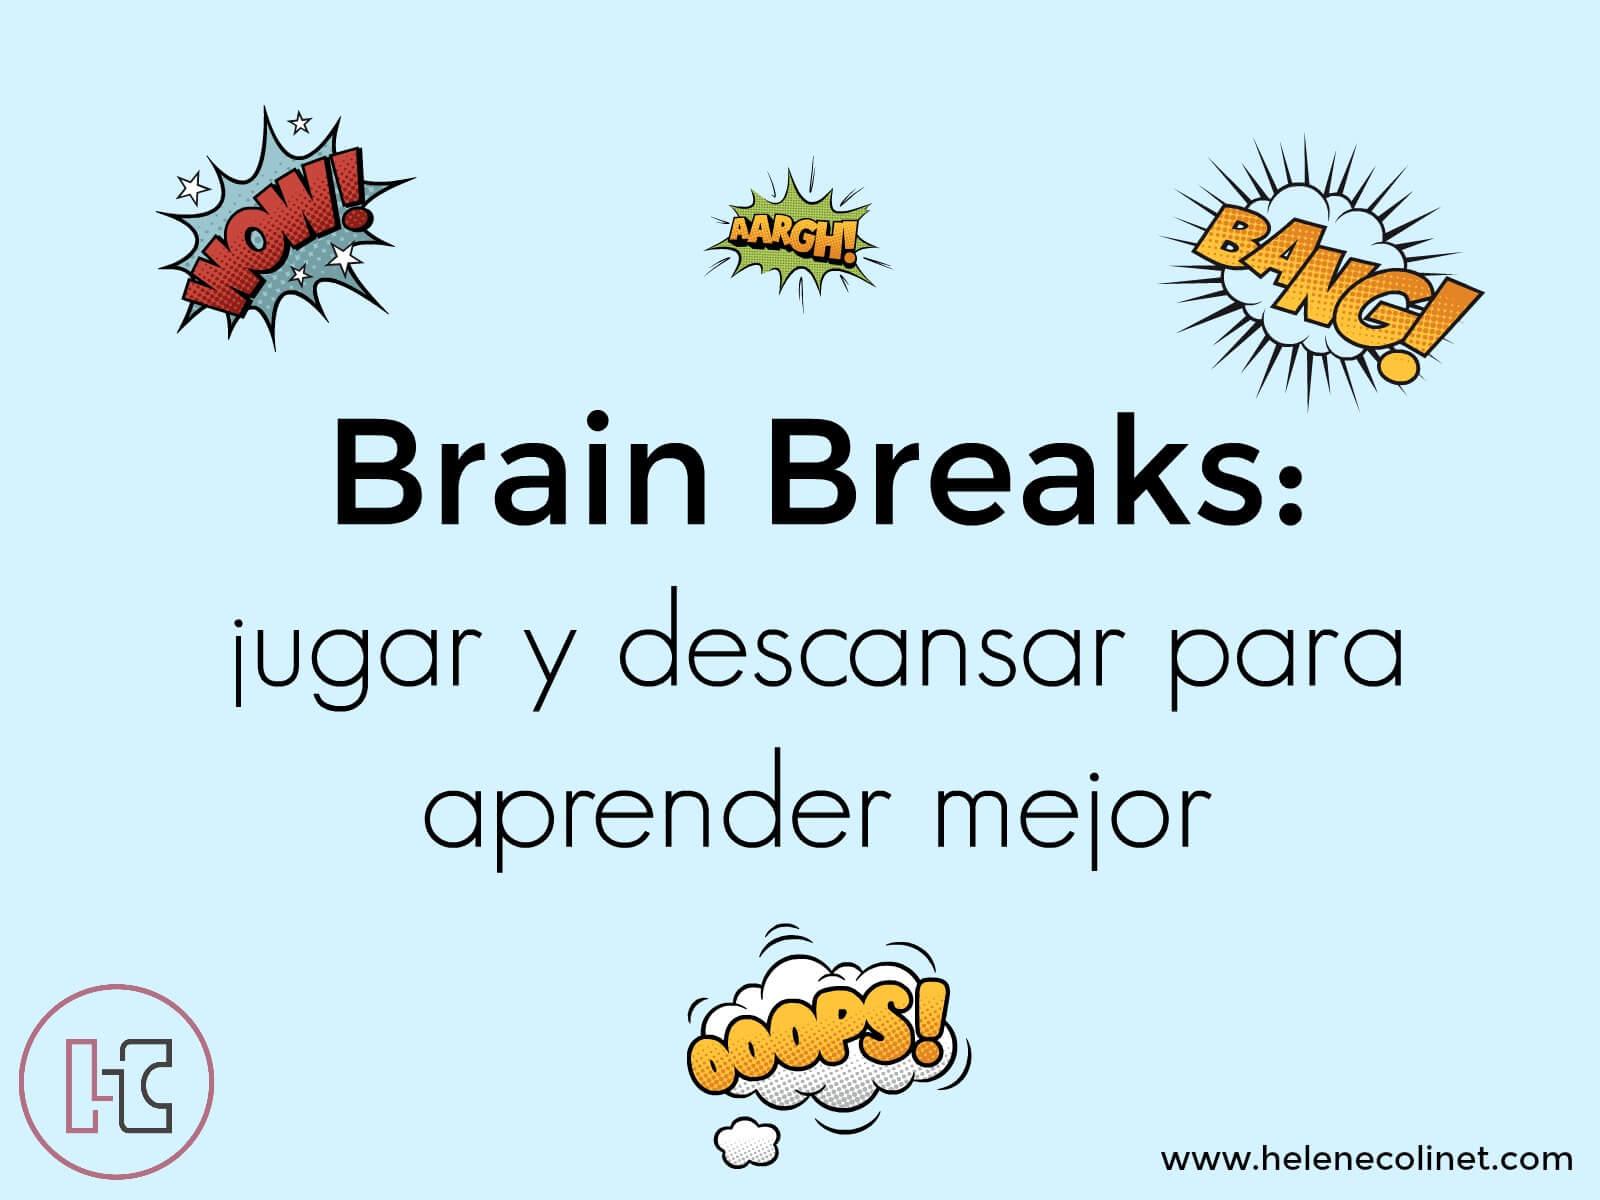 brain breaks helene colinet tprs españa ci idiomas